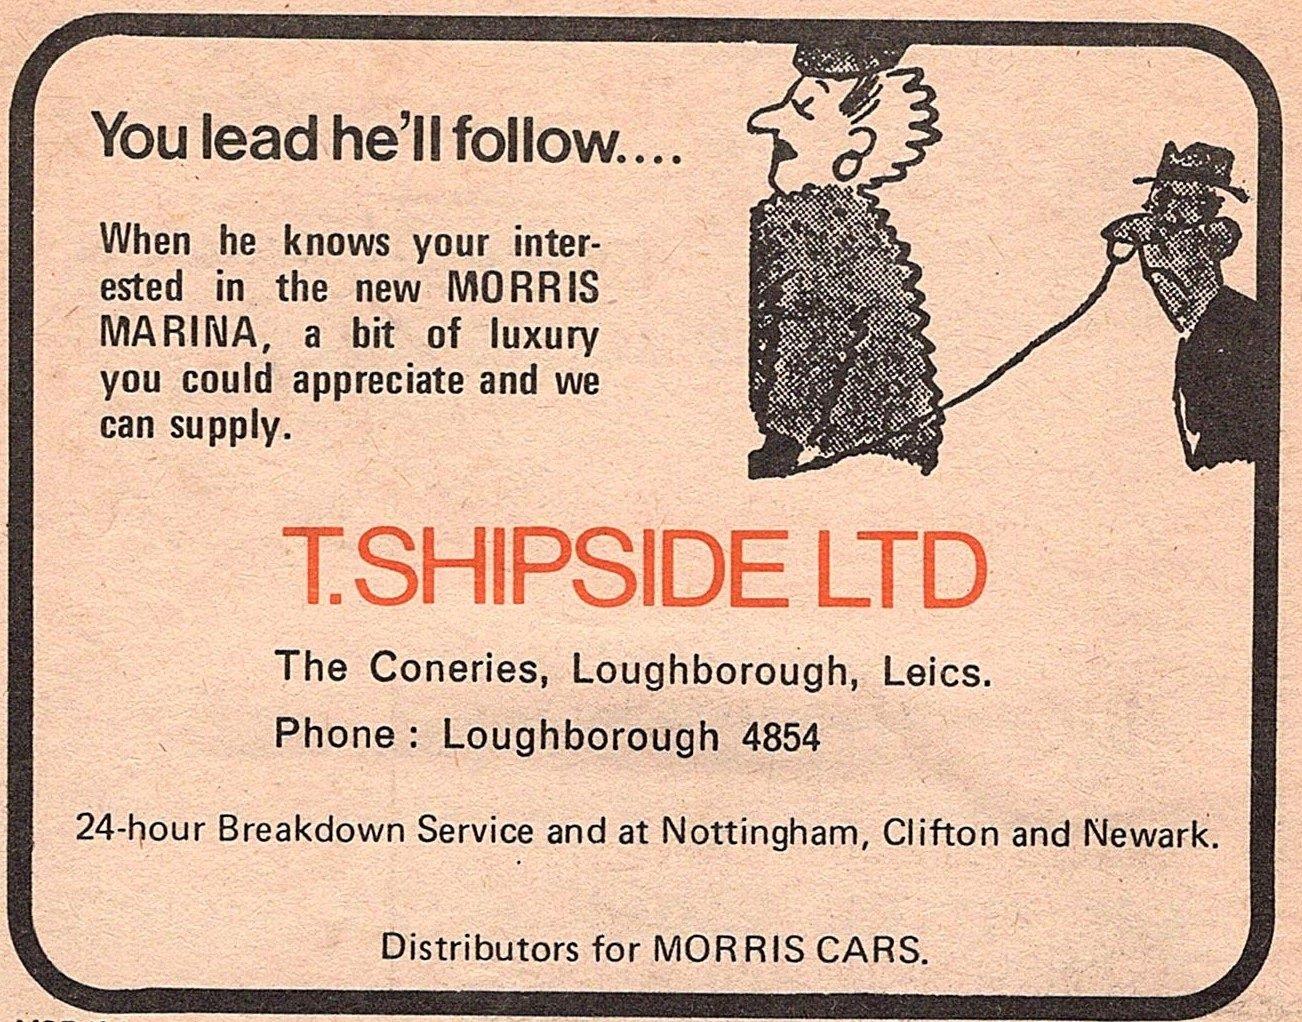 T_ShipsidesLtd1971.jpg